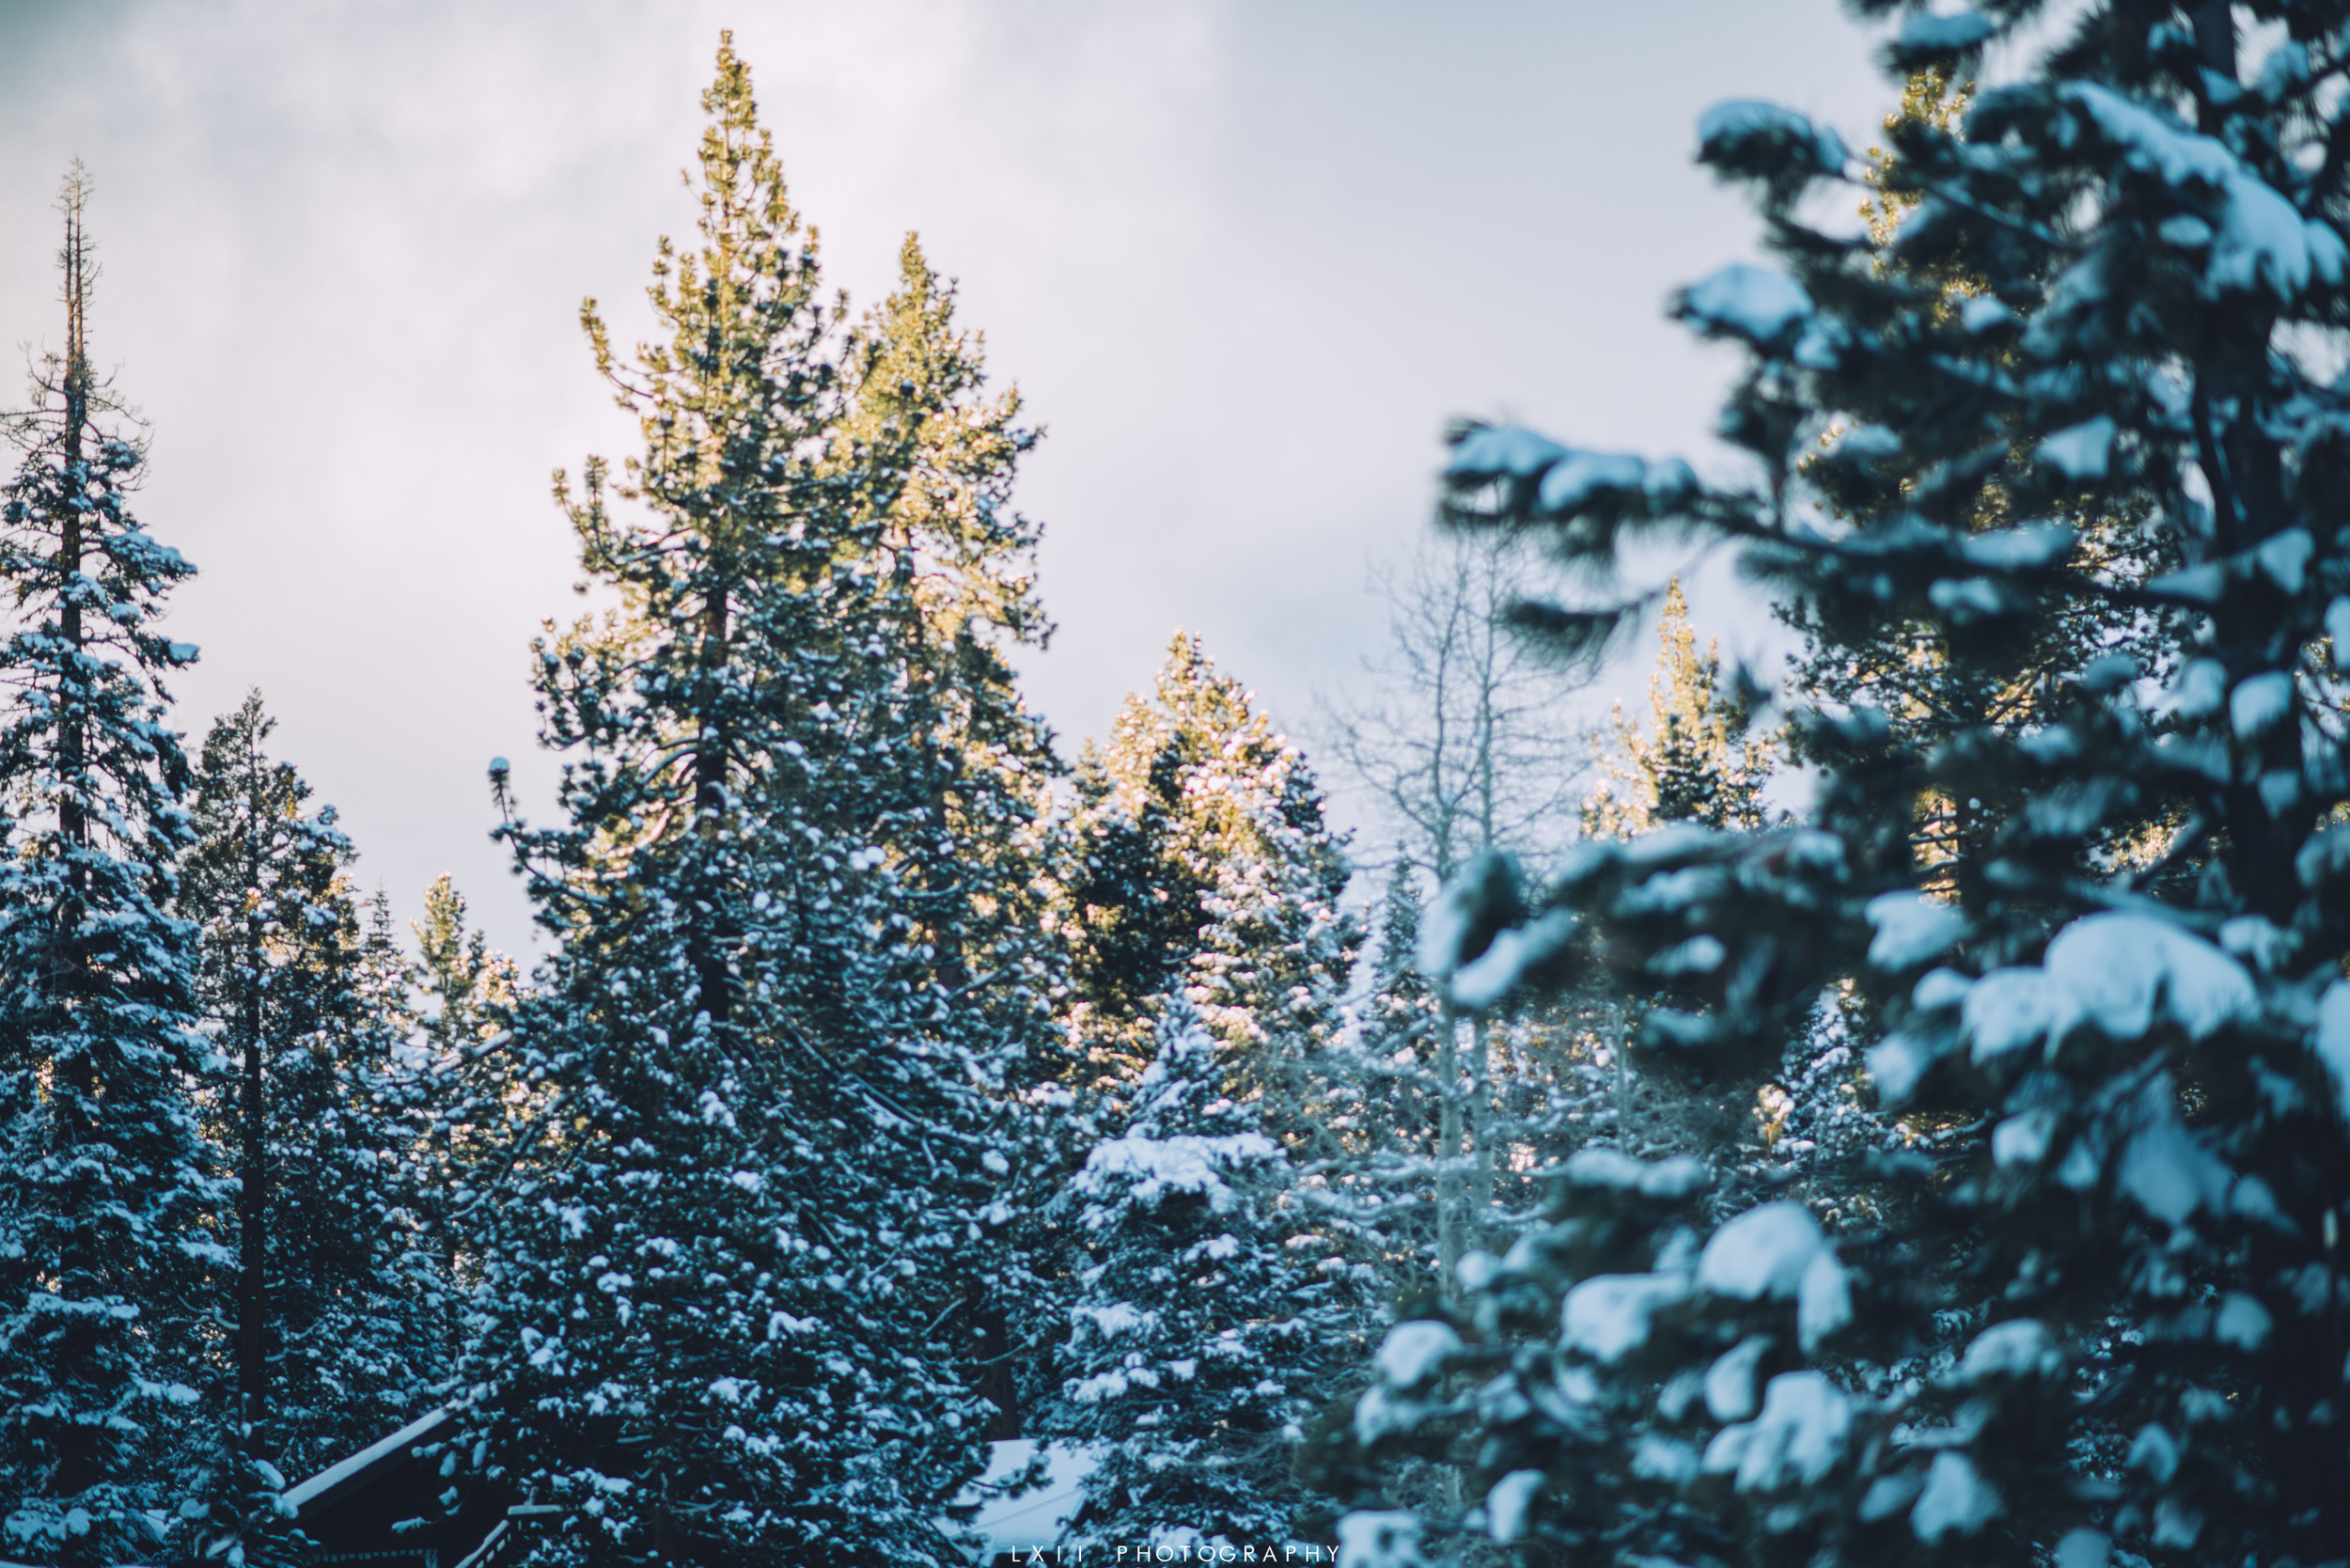 ChristmasVacation2015-7.jpg